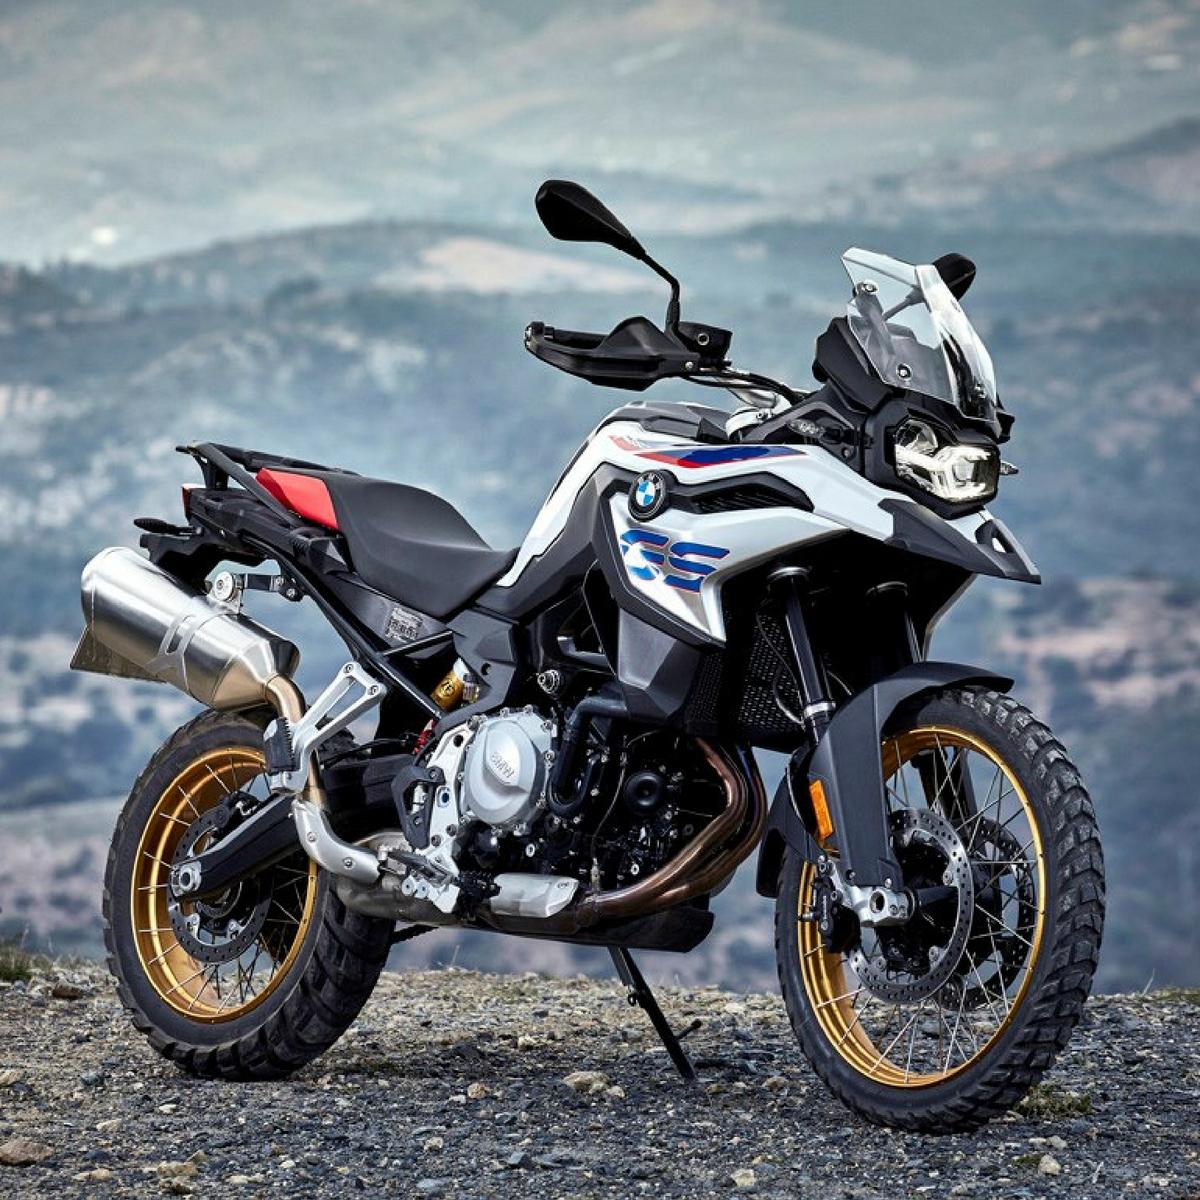 Bmw F850 Gs Model Power Mileage Safety Colors Sagmart Motocicletas Bmw Bmw Motos Guapas